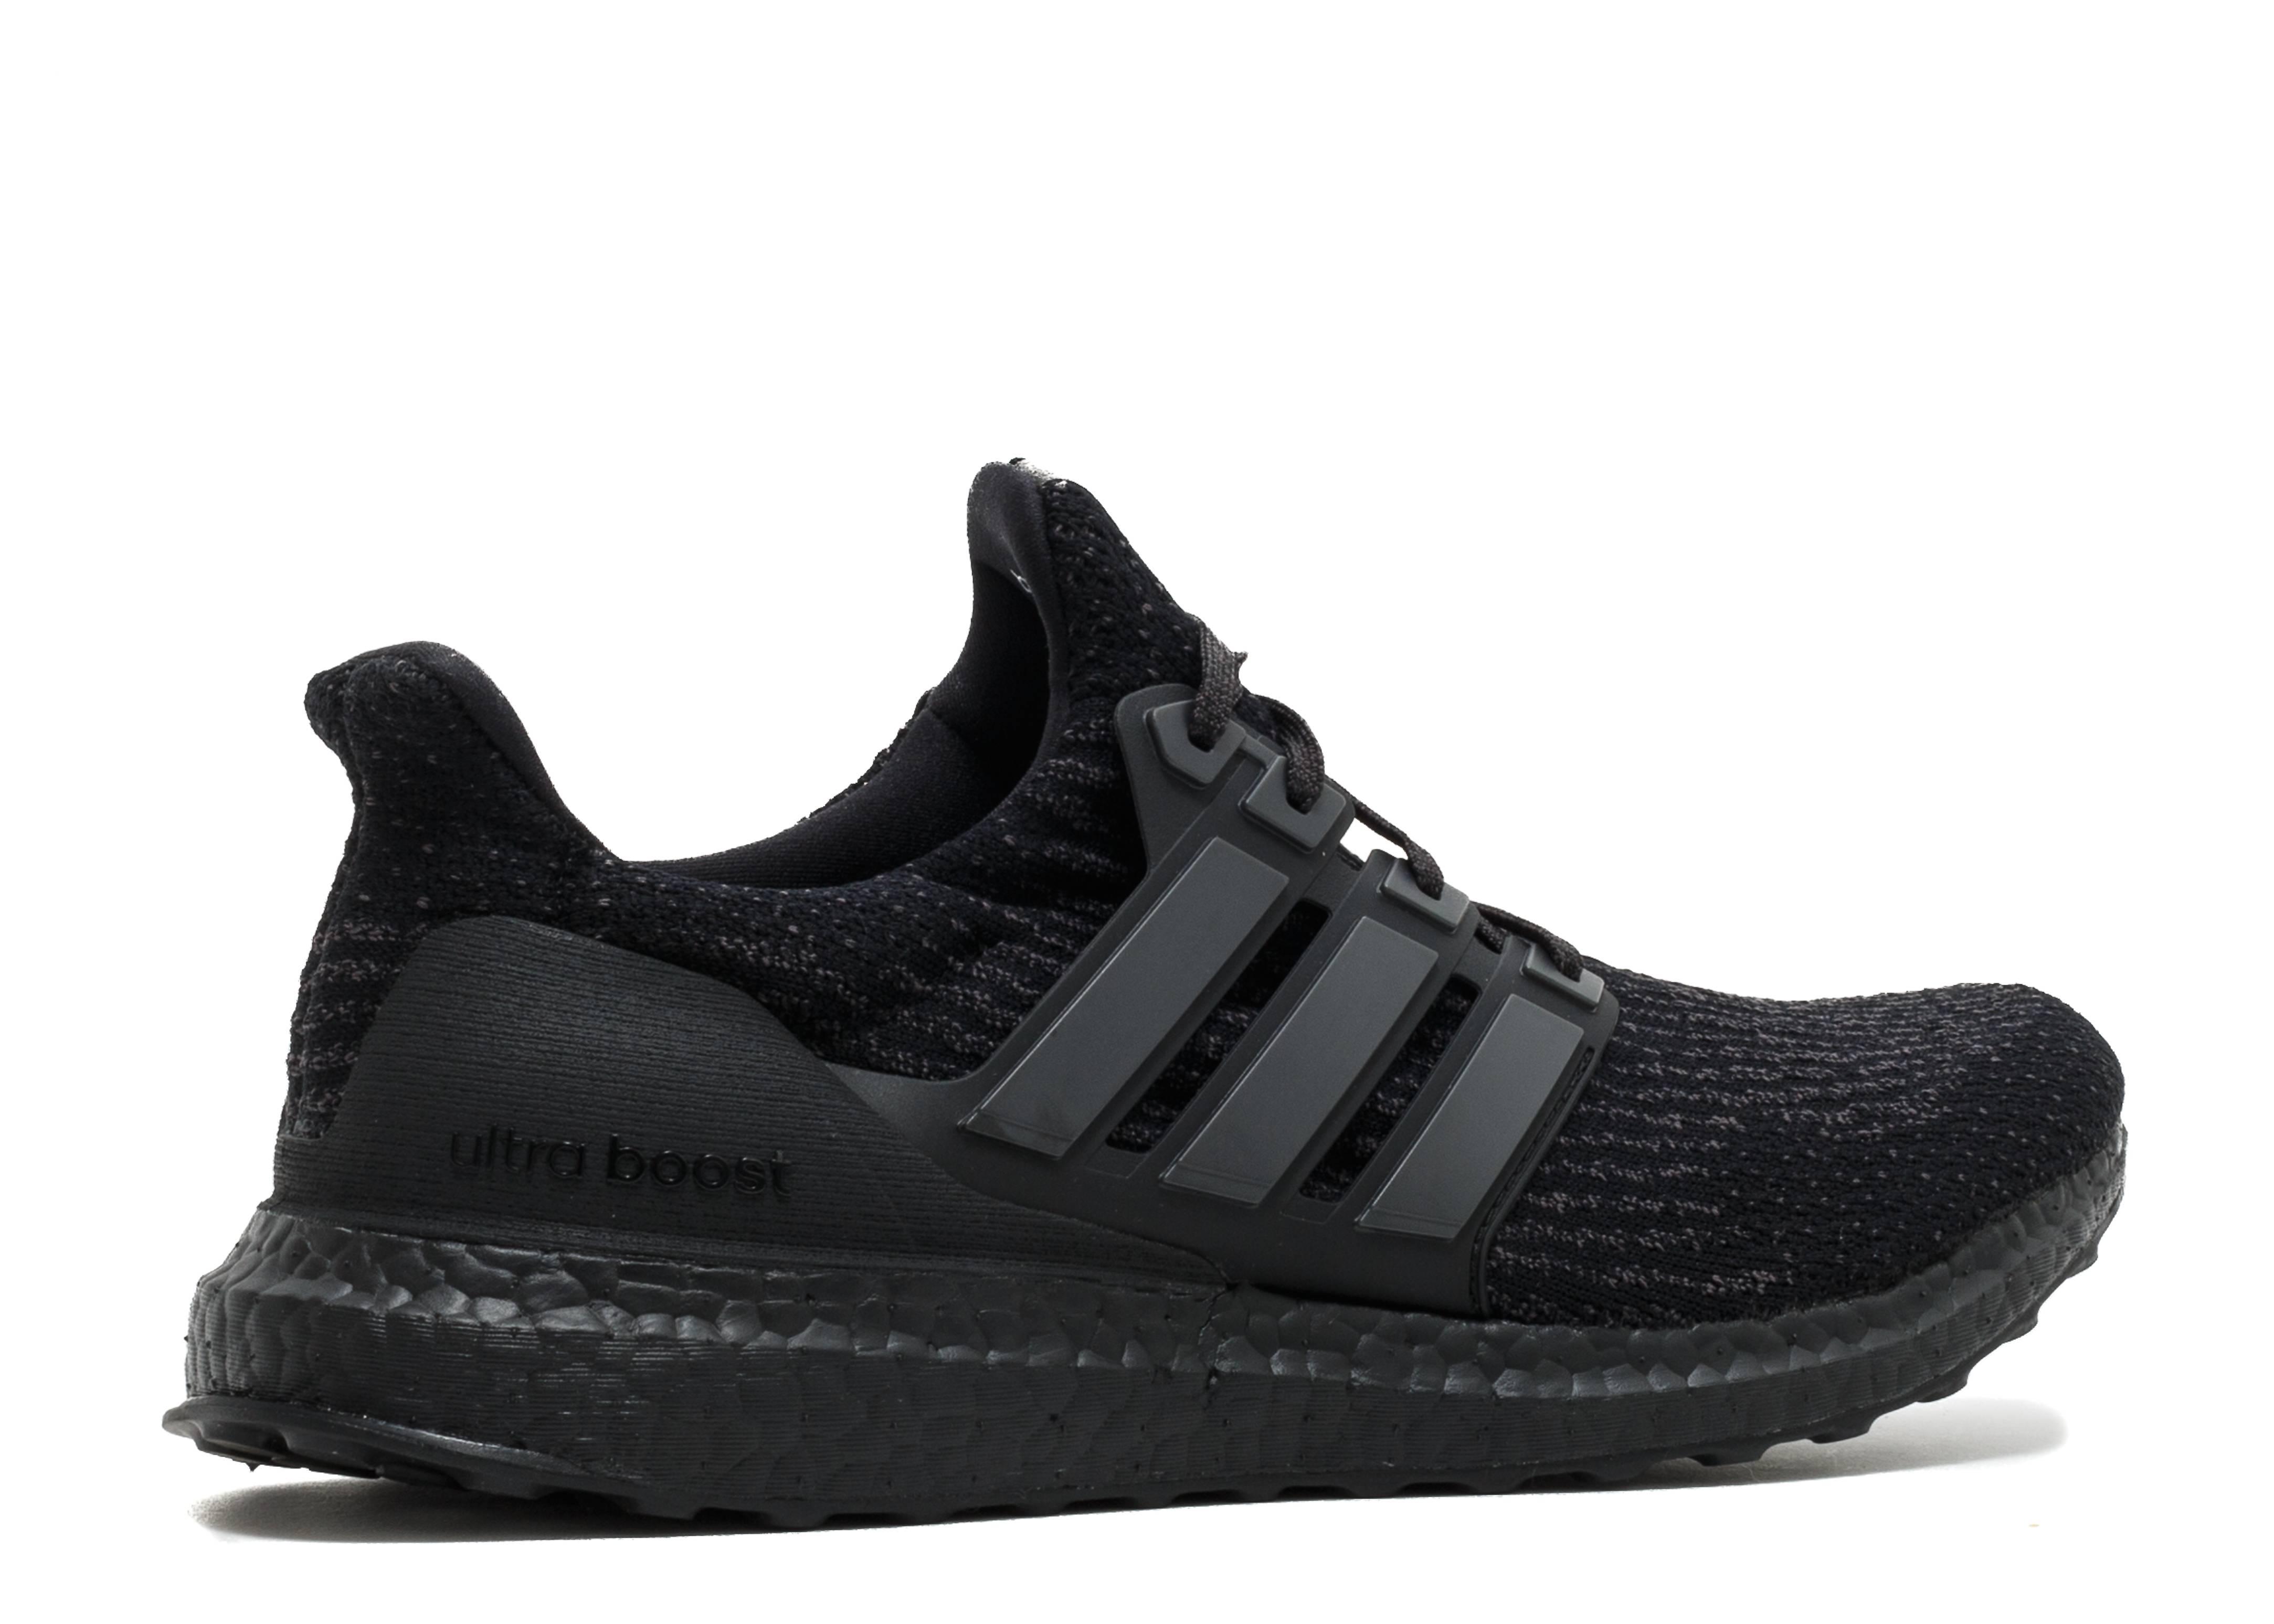 537cf19867e1a Adidas Ultra Boost 3.0 Triple Black 2.0 - 3